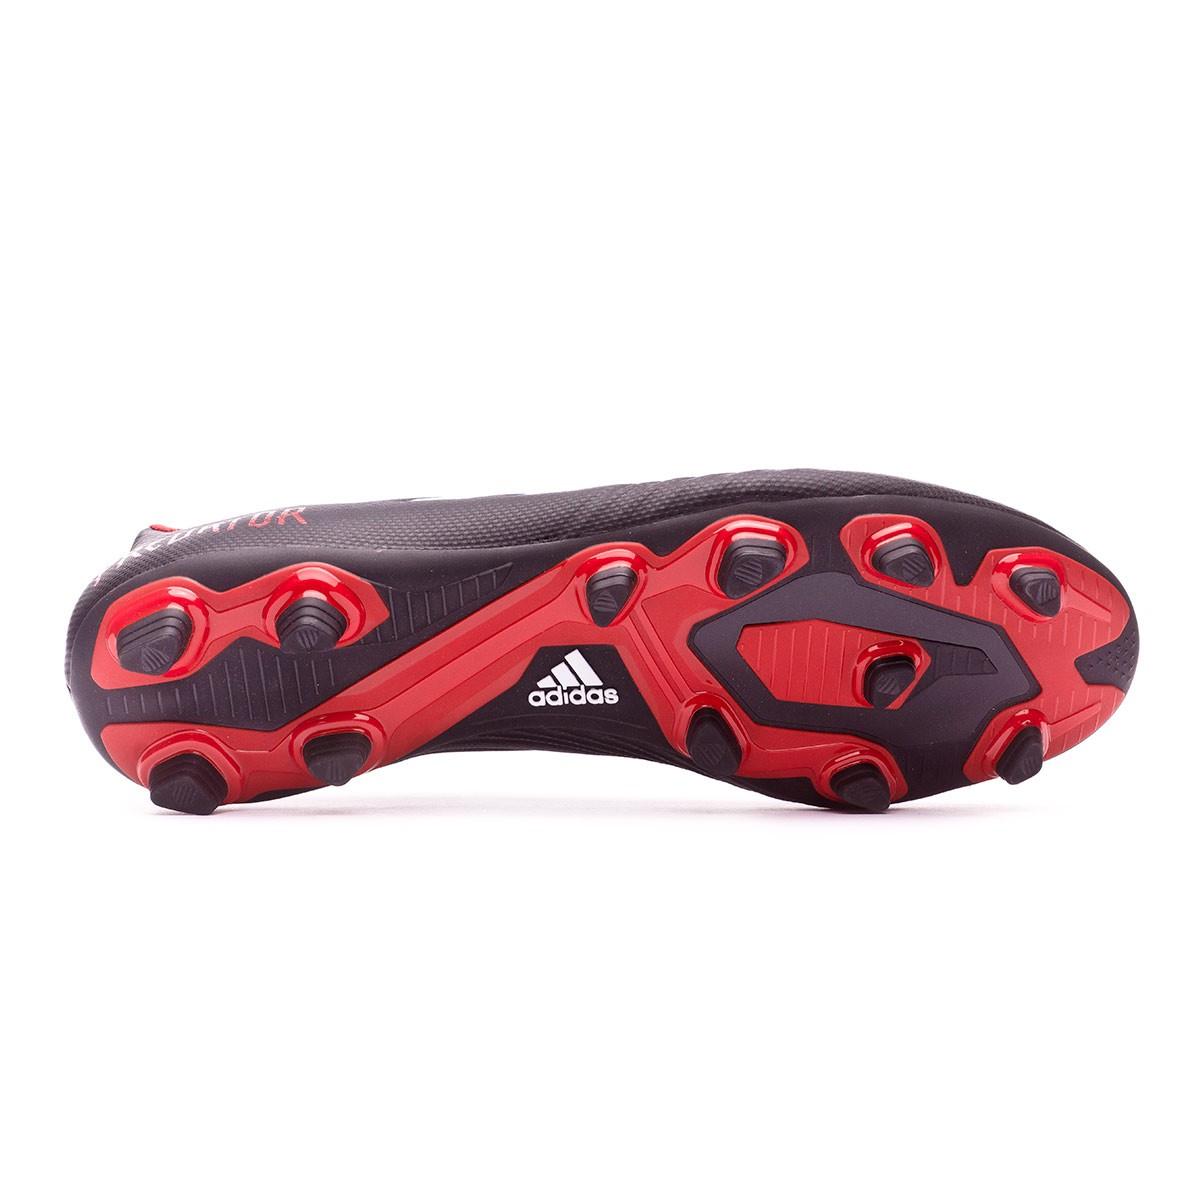 07027bc872511 Football Boots adidas Predator 18.4 FxG Core black-White-Red - Tienda de  fútbol Fútbol Emotion